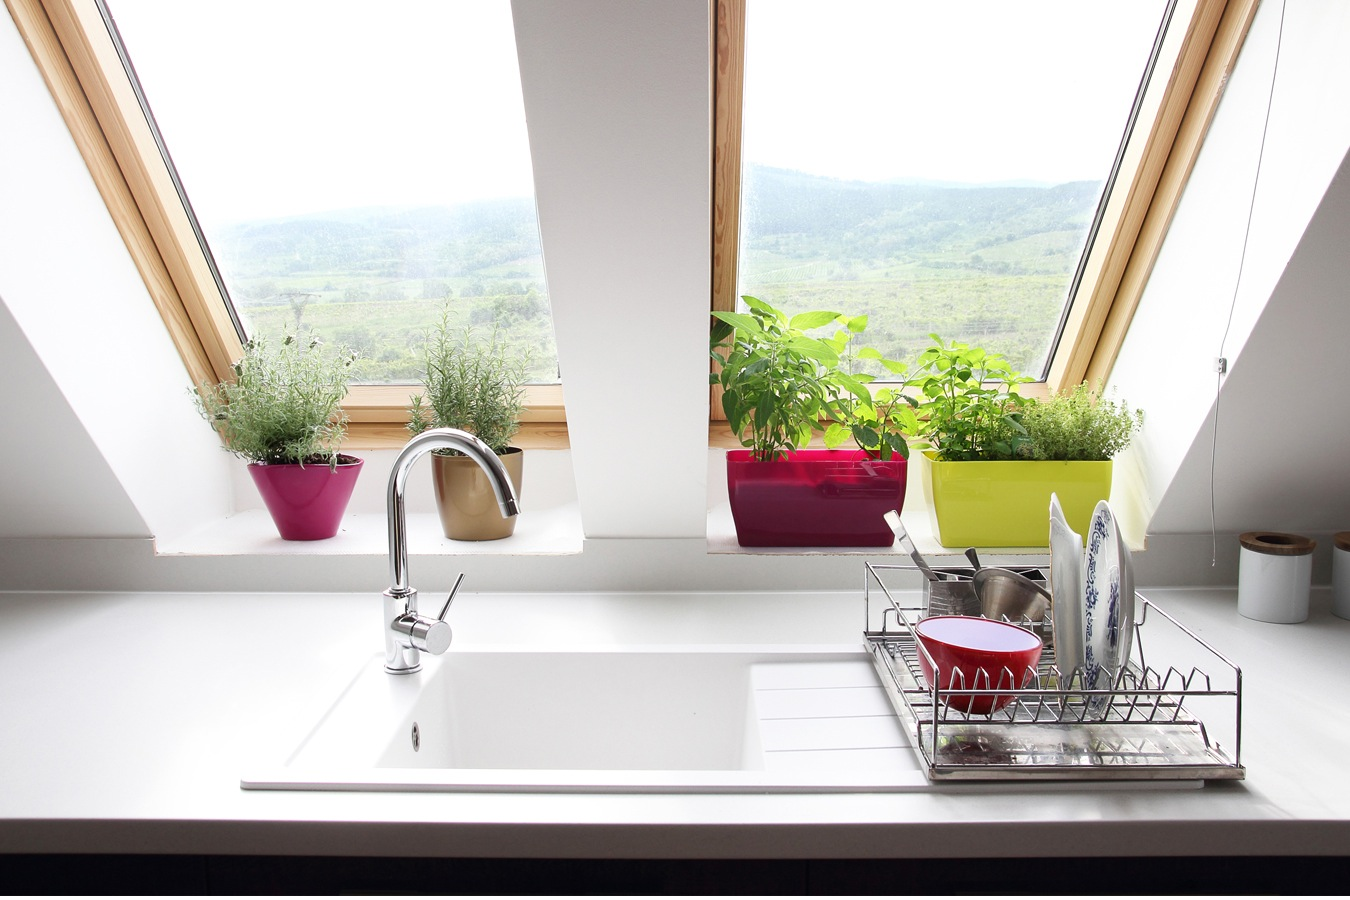 Keukenkast Met Oven En Magnetronkast Oven Inbouw : Keukenkast glas ...